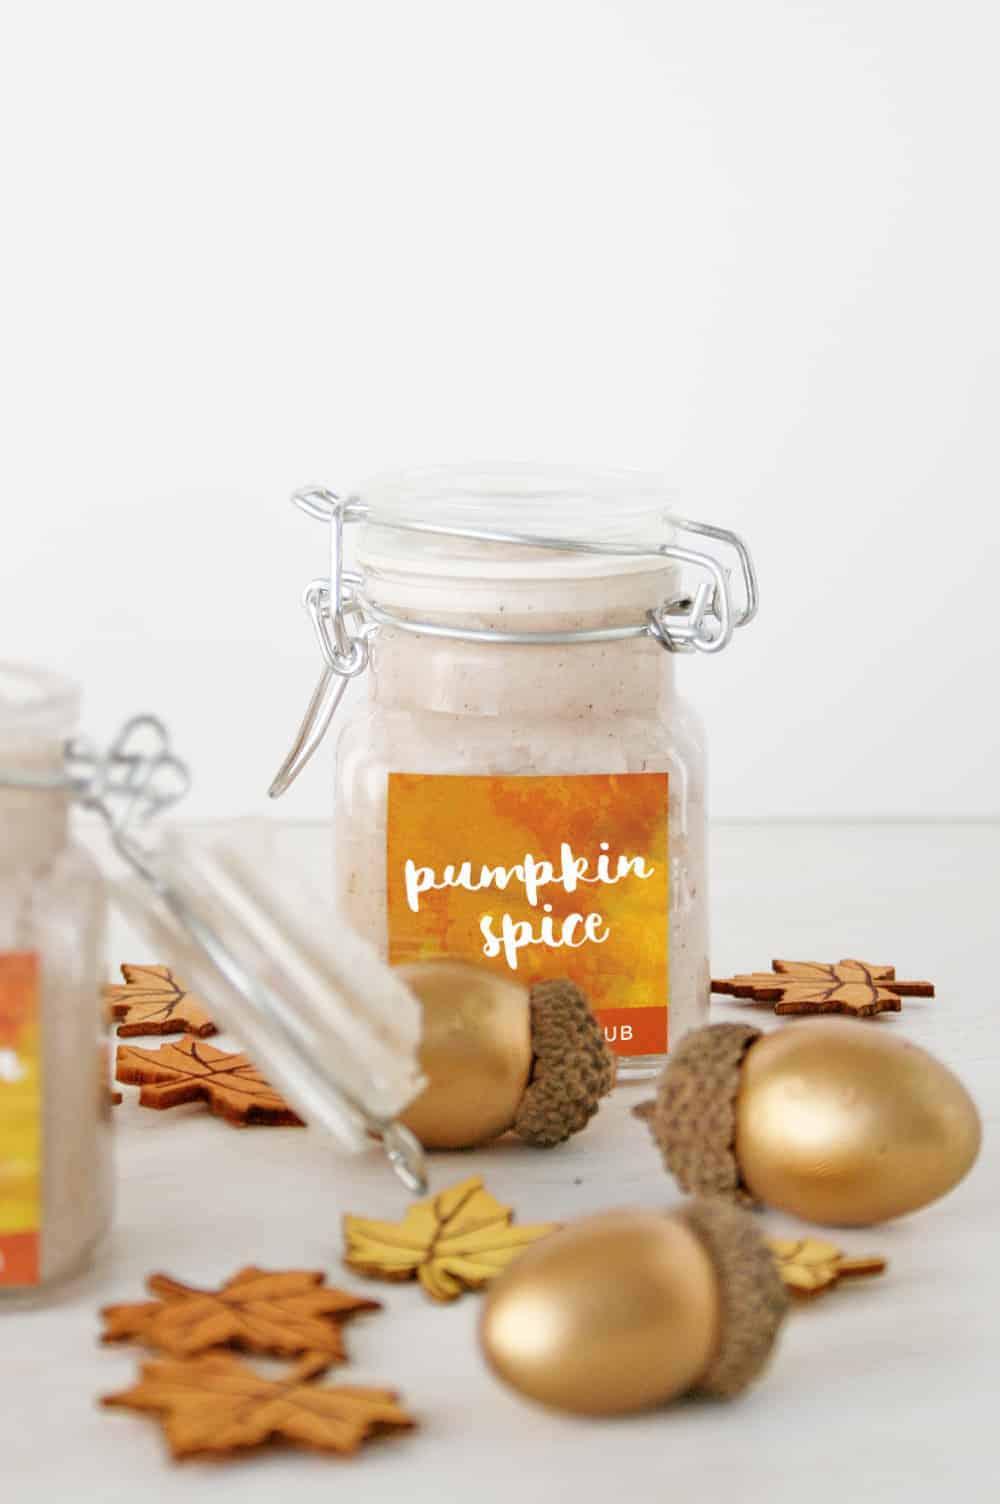 Pumpkin-Spice-Sugar-Lip-Scrub-4